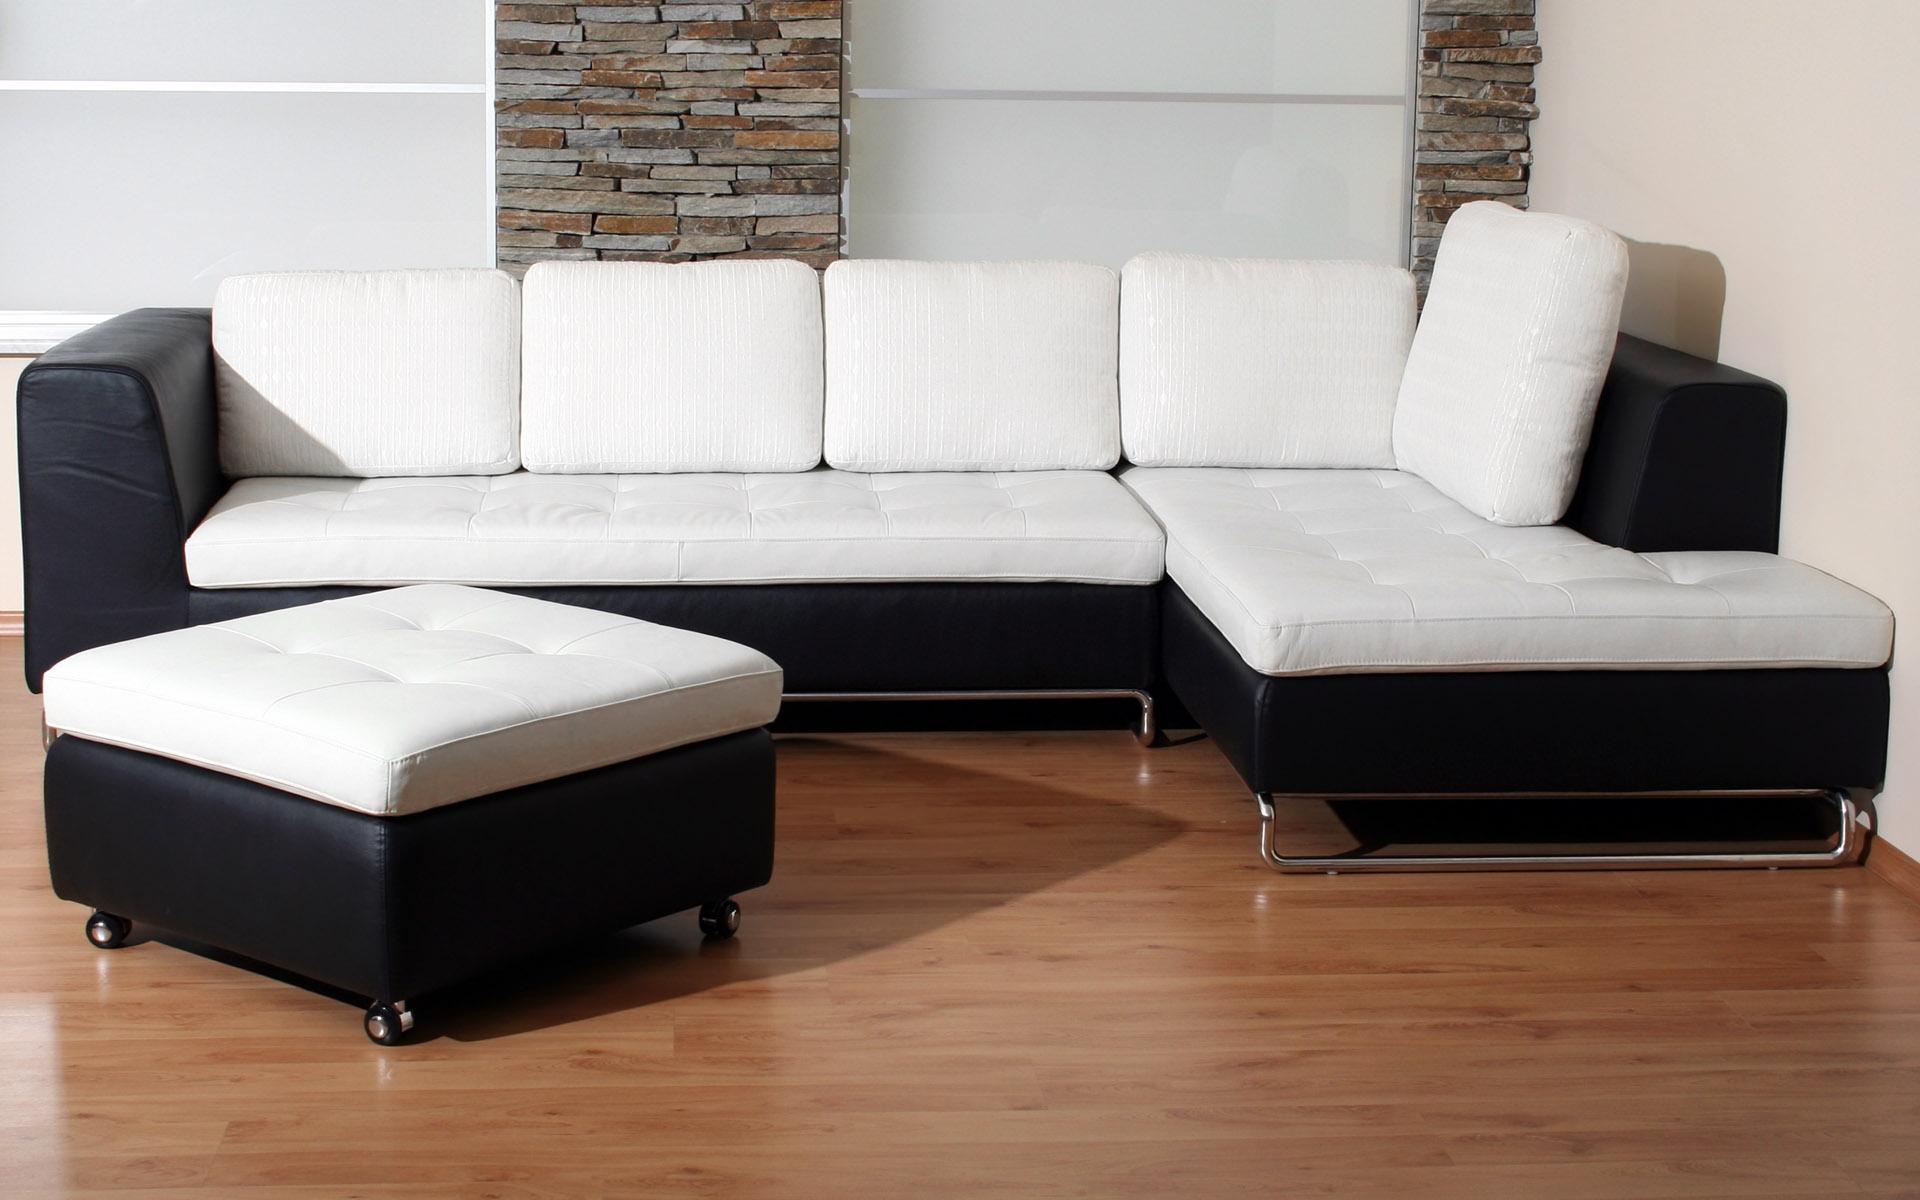 Fondos de pantalla : interior, mesa, silla, diseño, piso, estilo ...